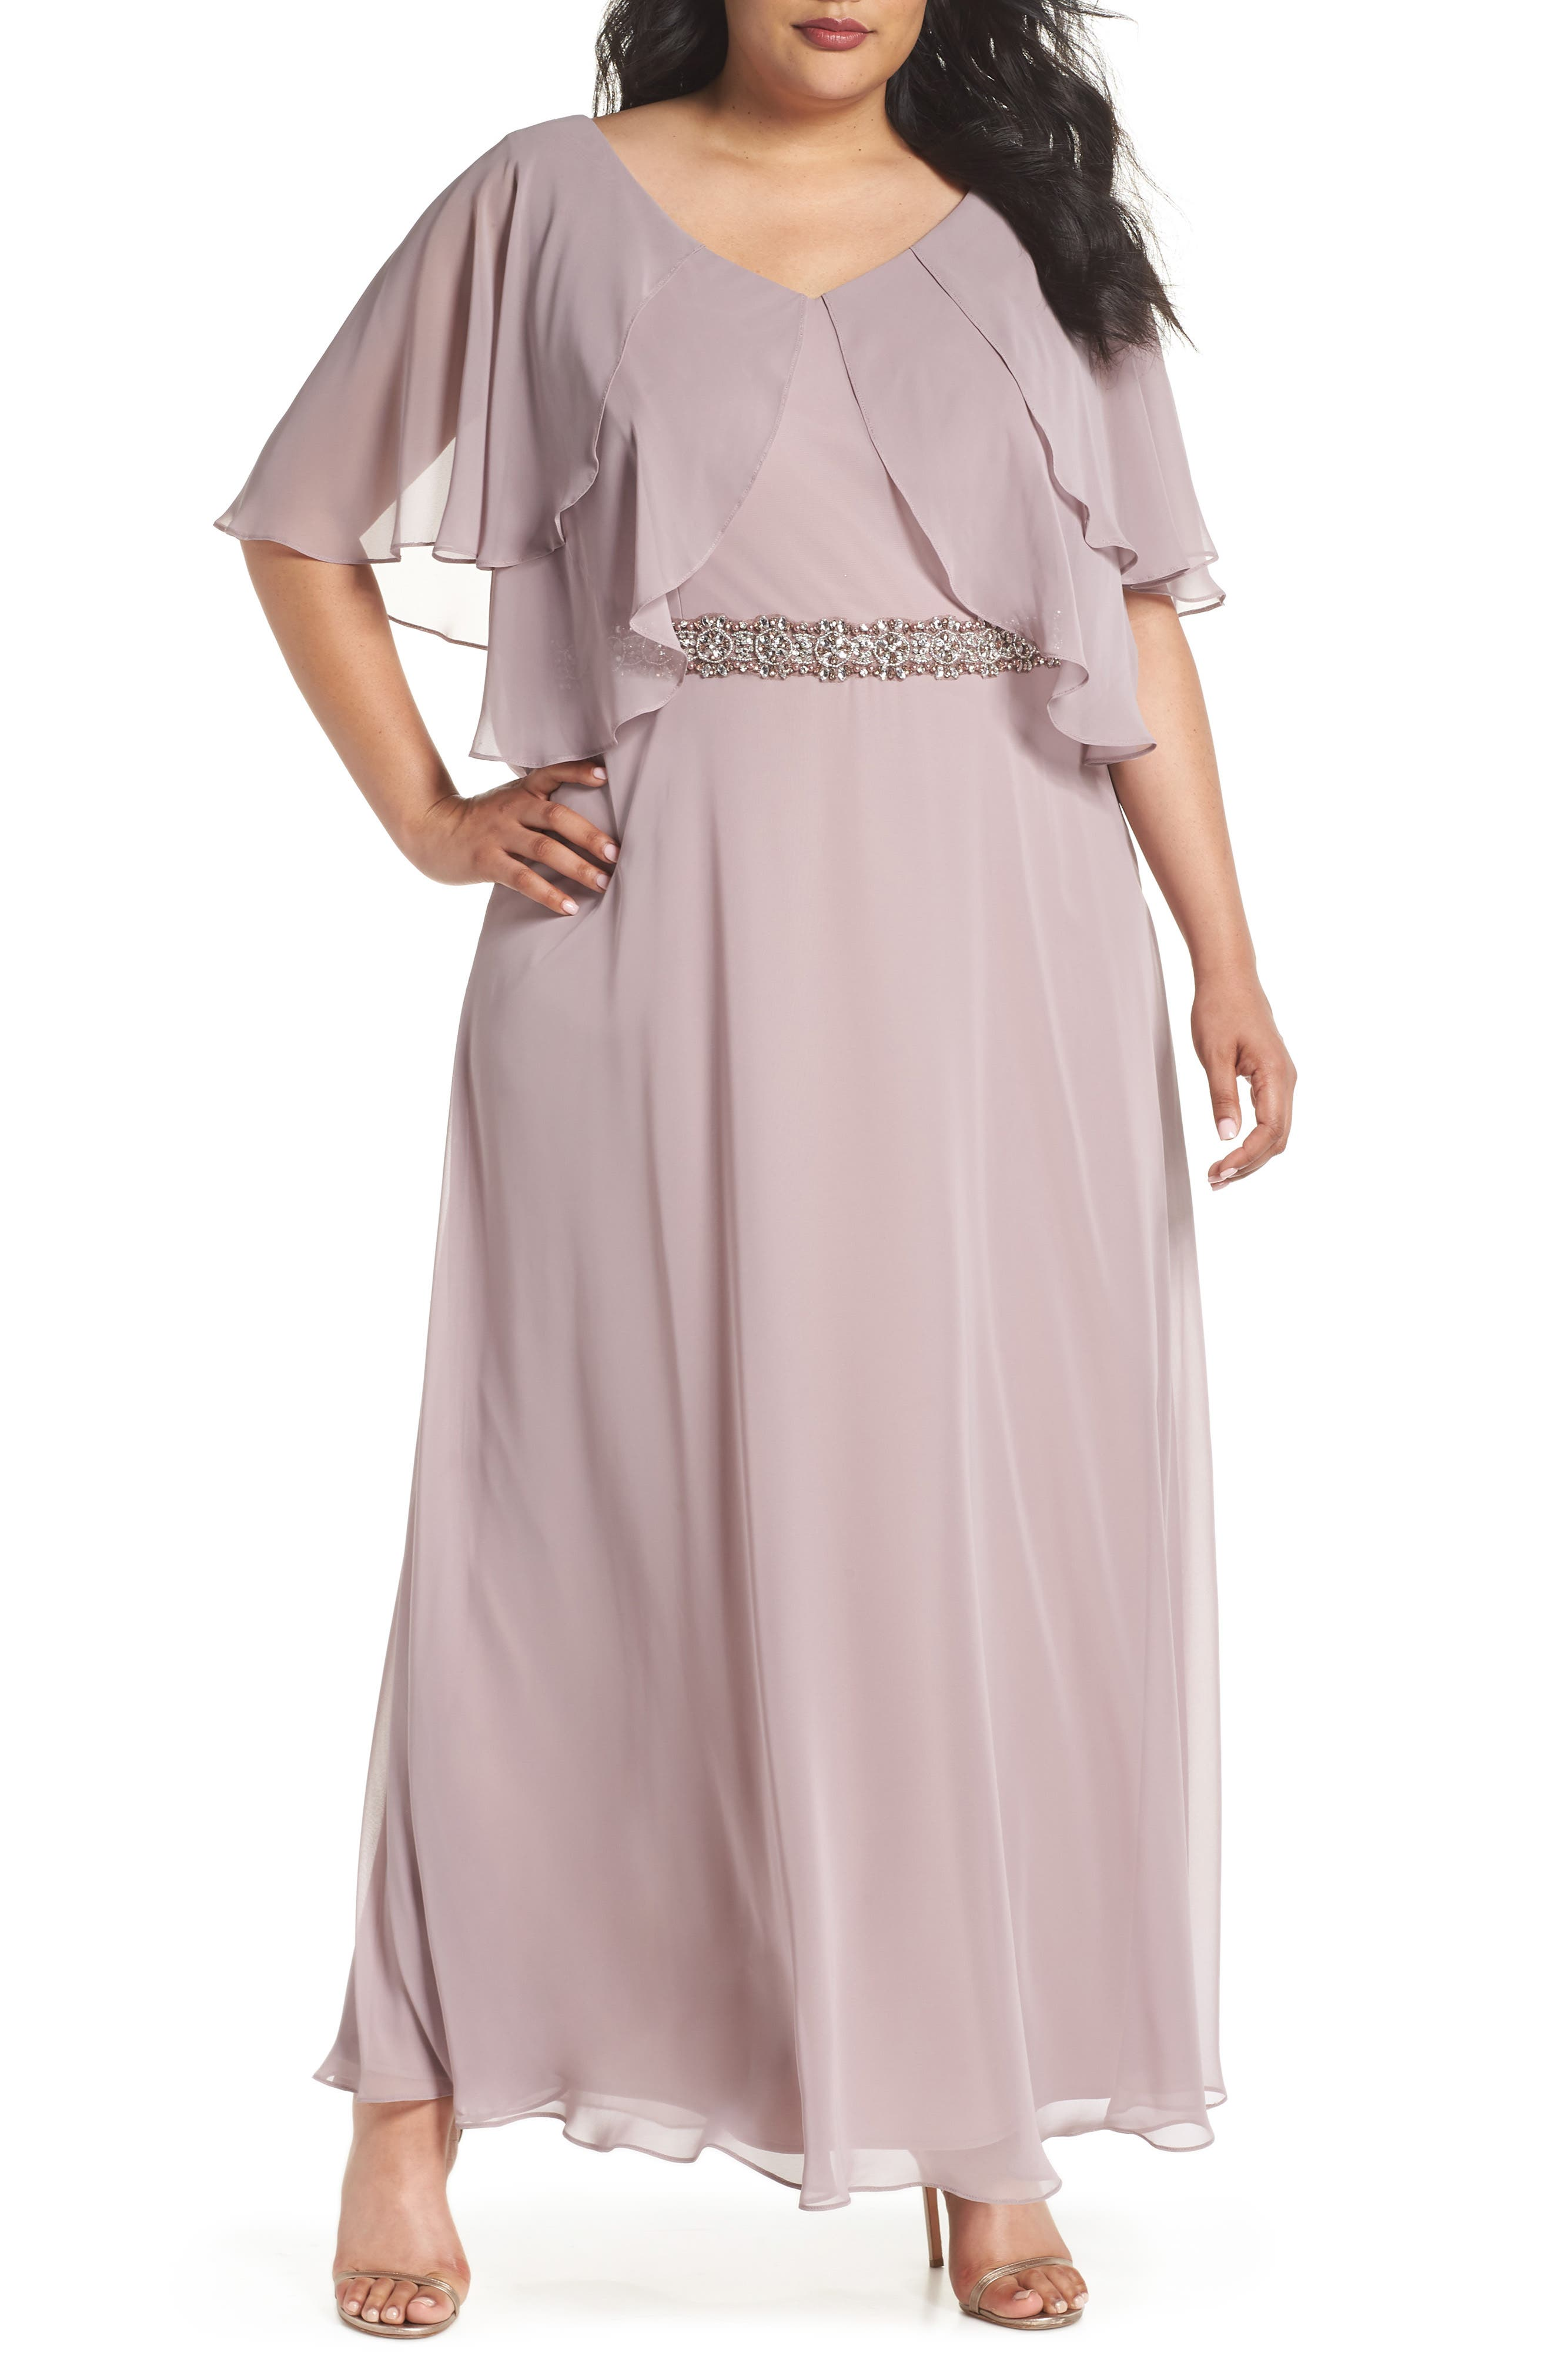 Alex Evenings Embellished Waist Flutter Dress (Plus Size)